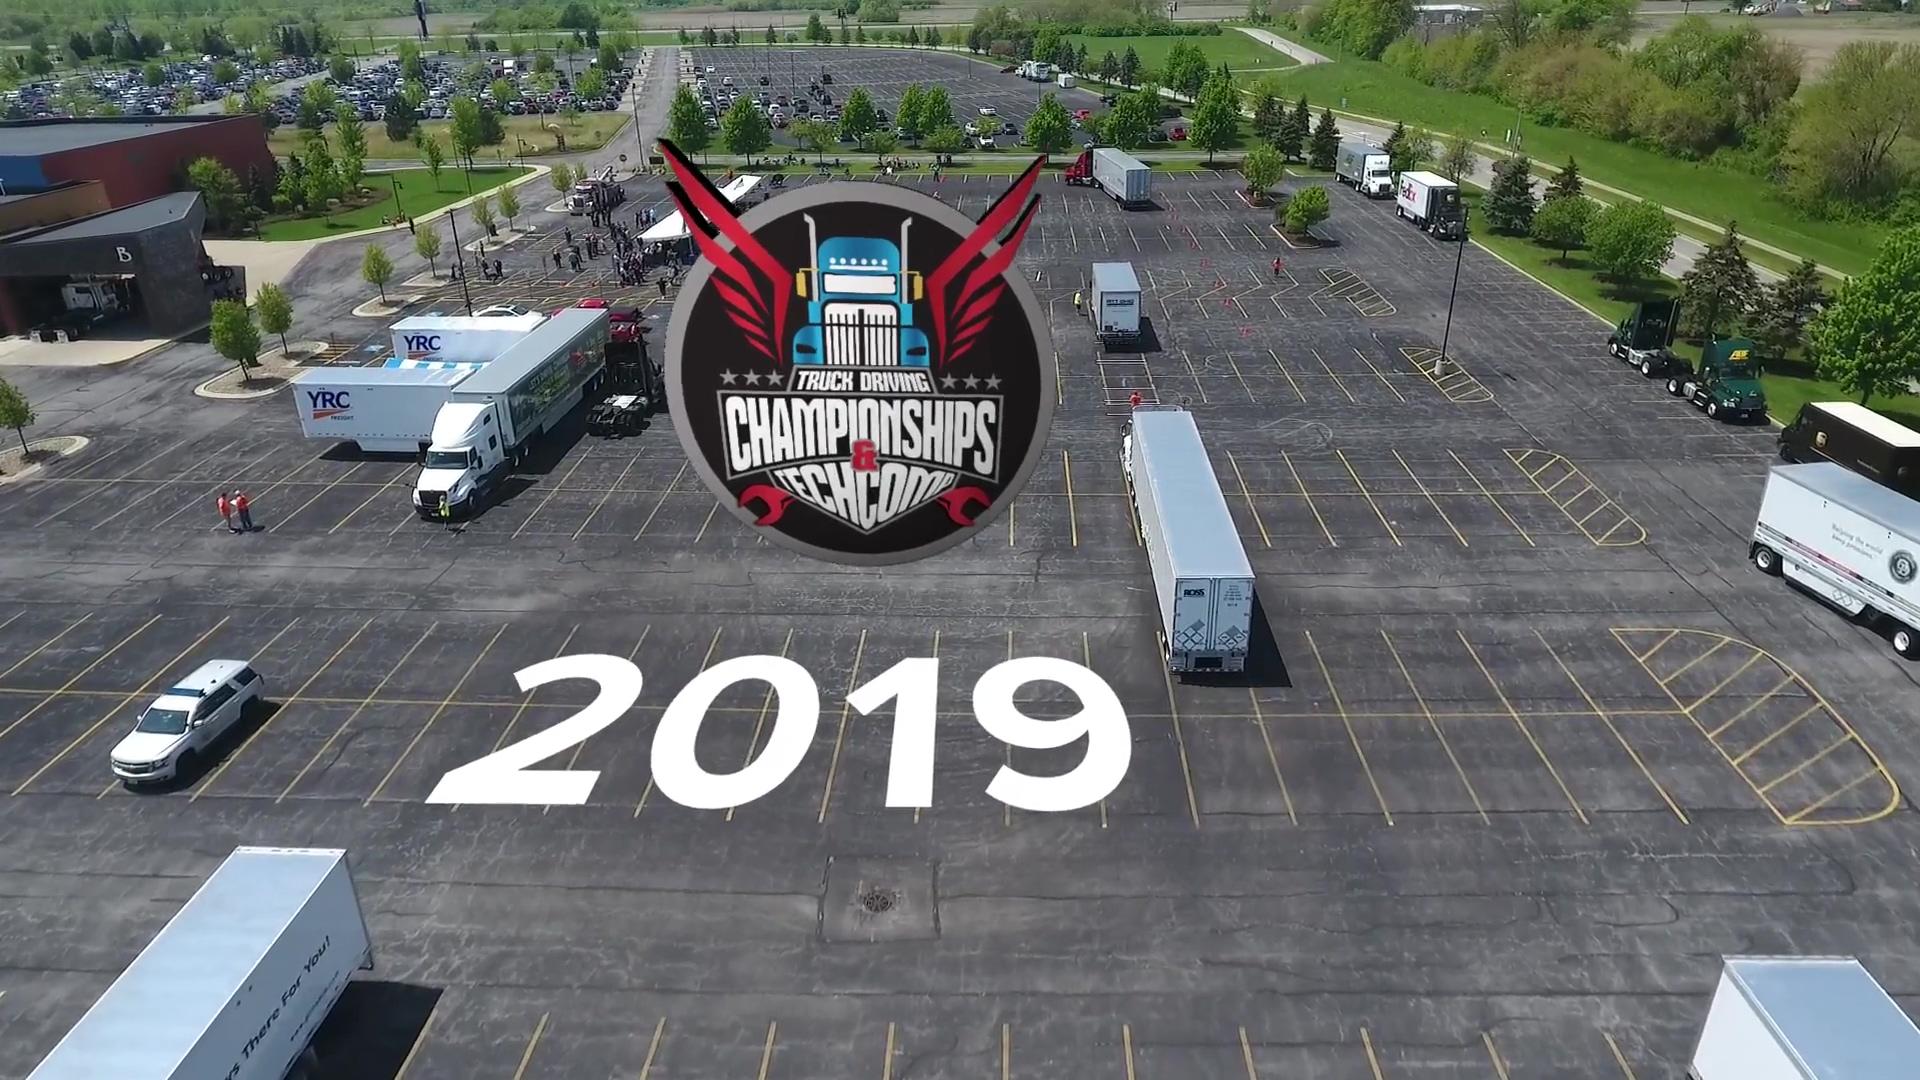 2019 Ohio Trucking Association Truck Driving Championships Recap